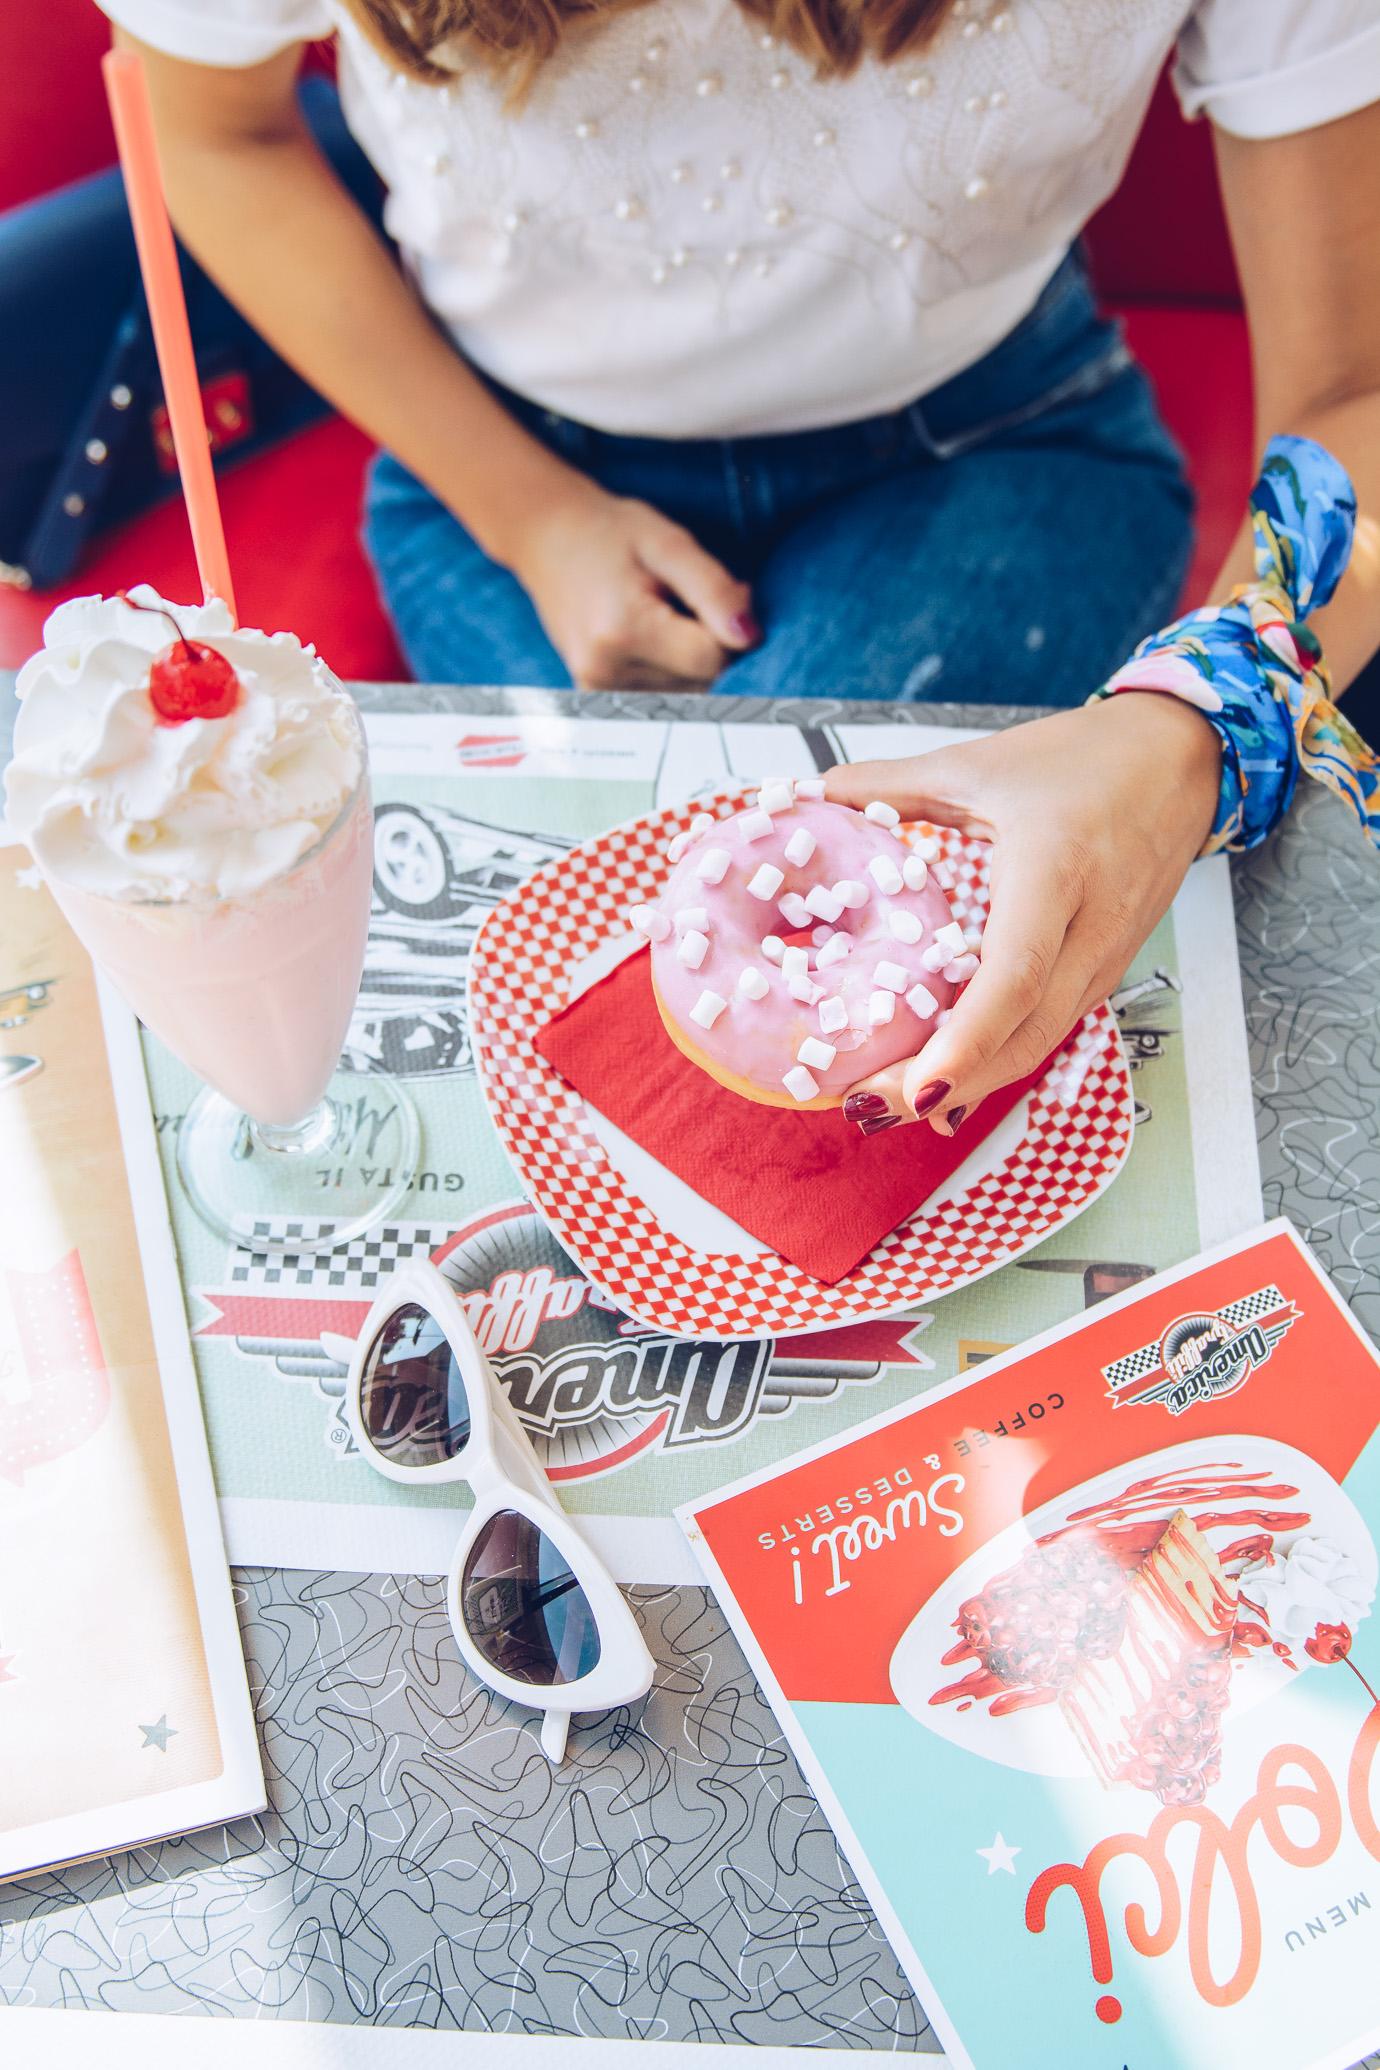 American doughnut 50s